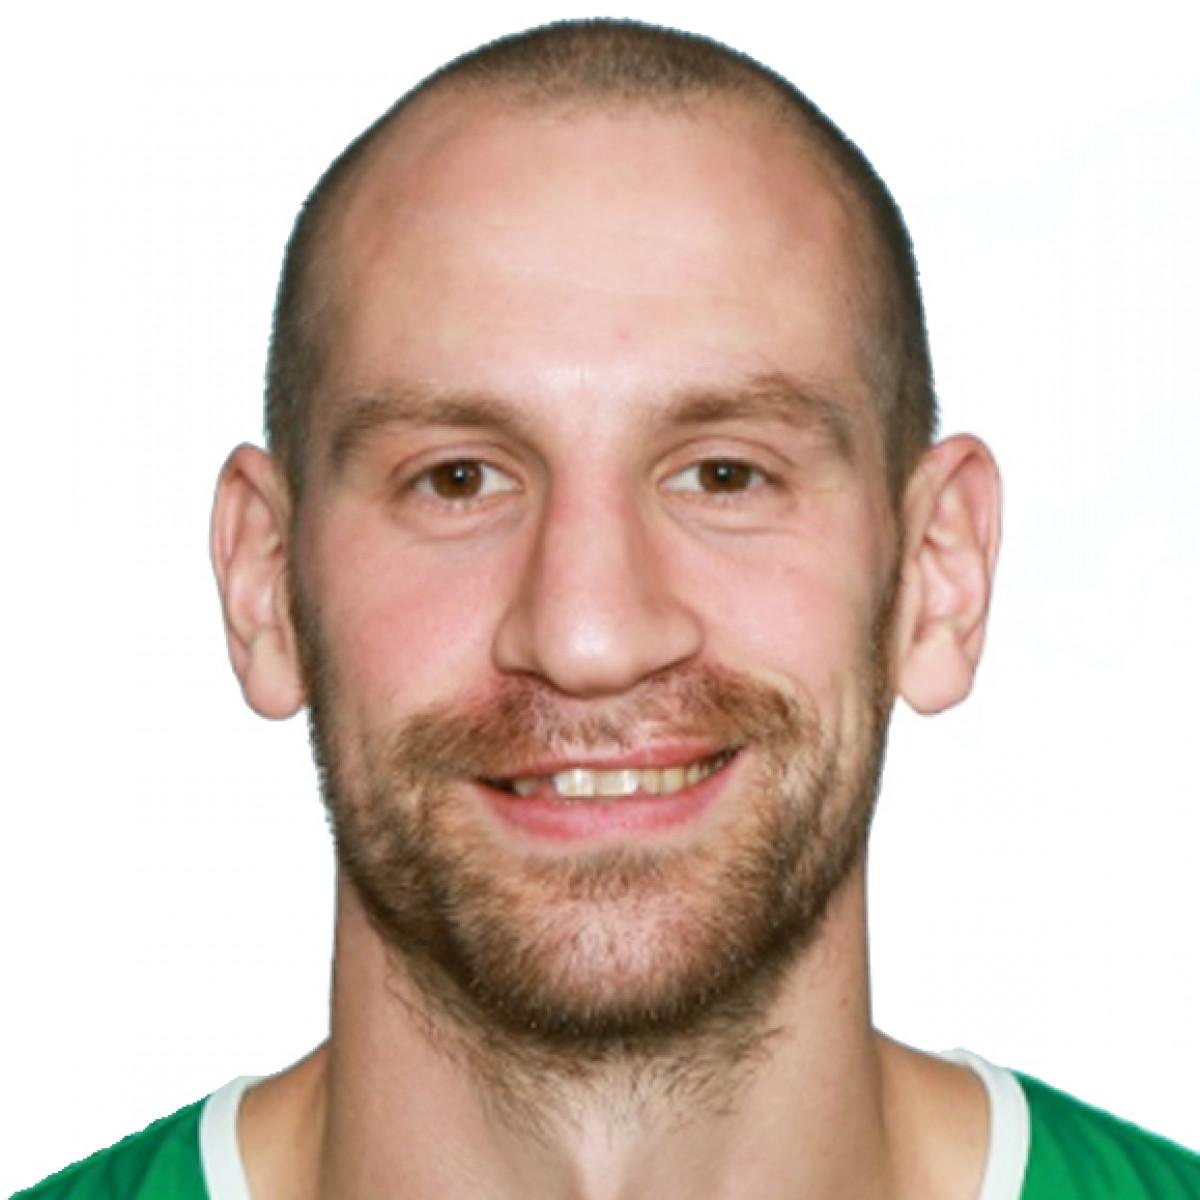 Martin Pahlmblad